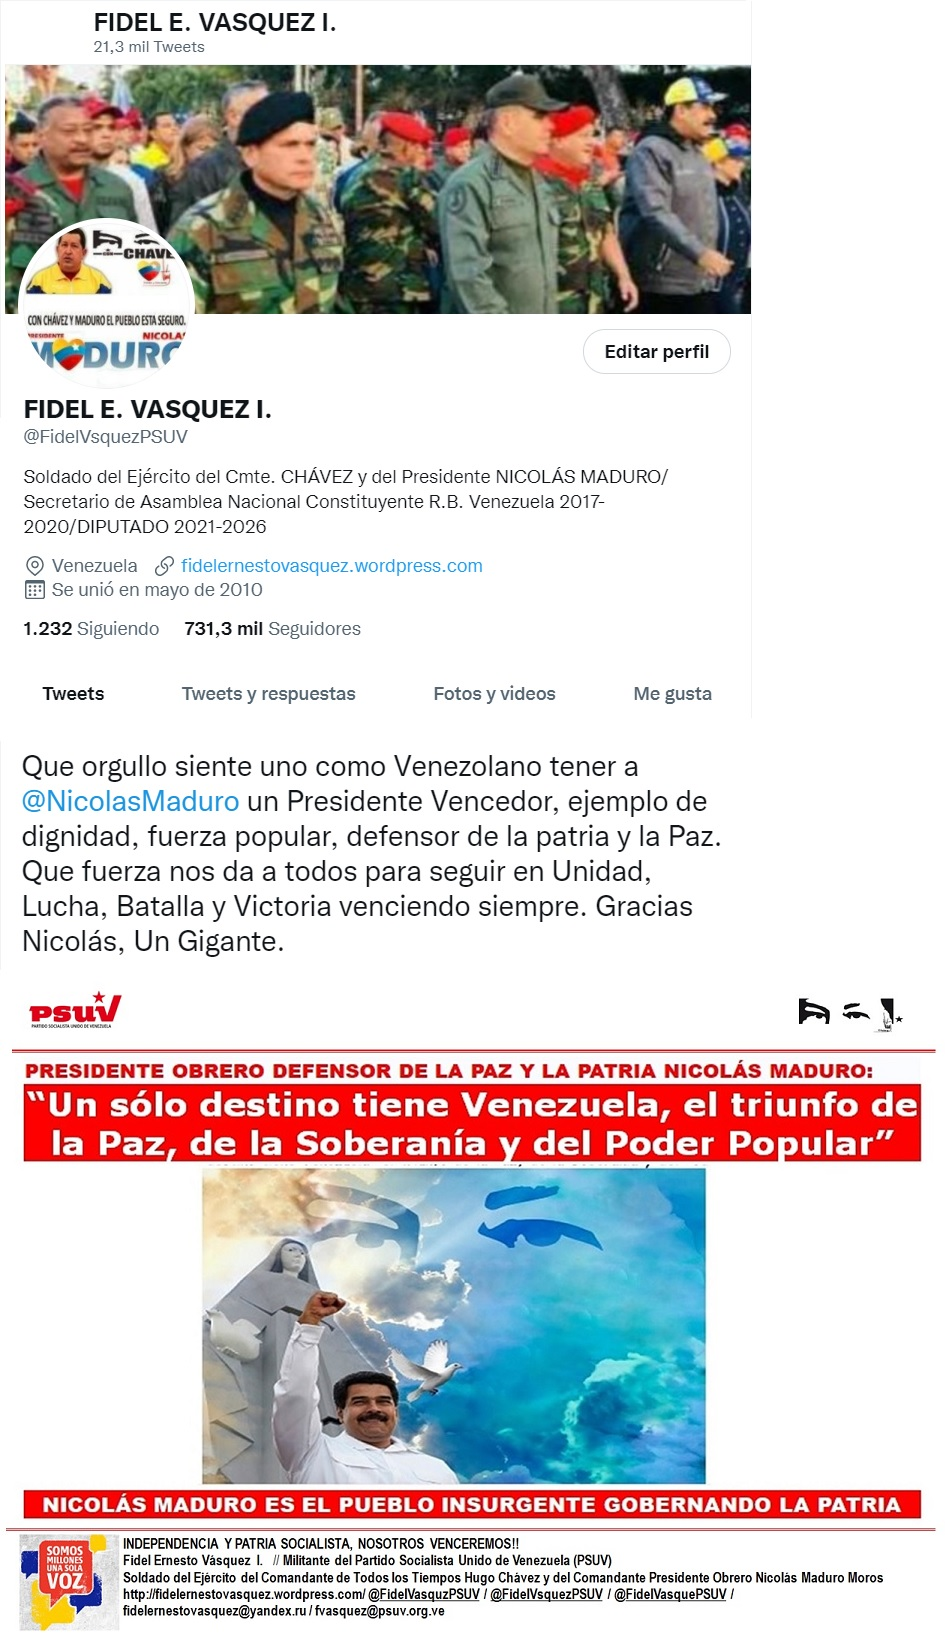 @NicolasMaduro @FidelVsquezPsuv Nosotros Venceremos